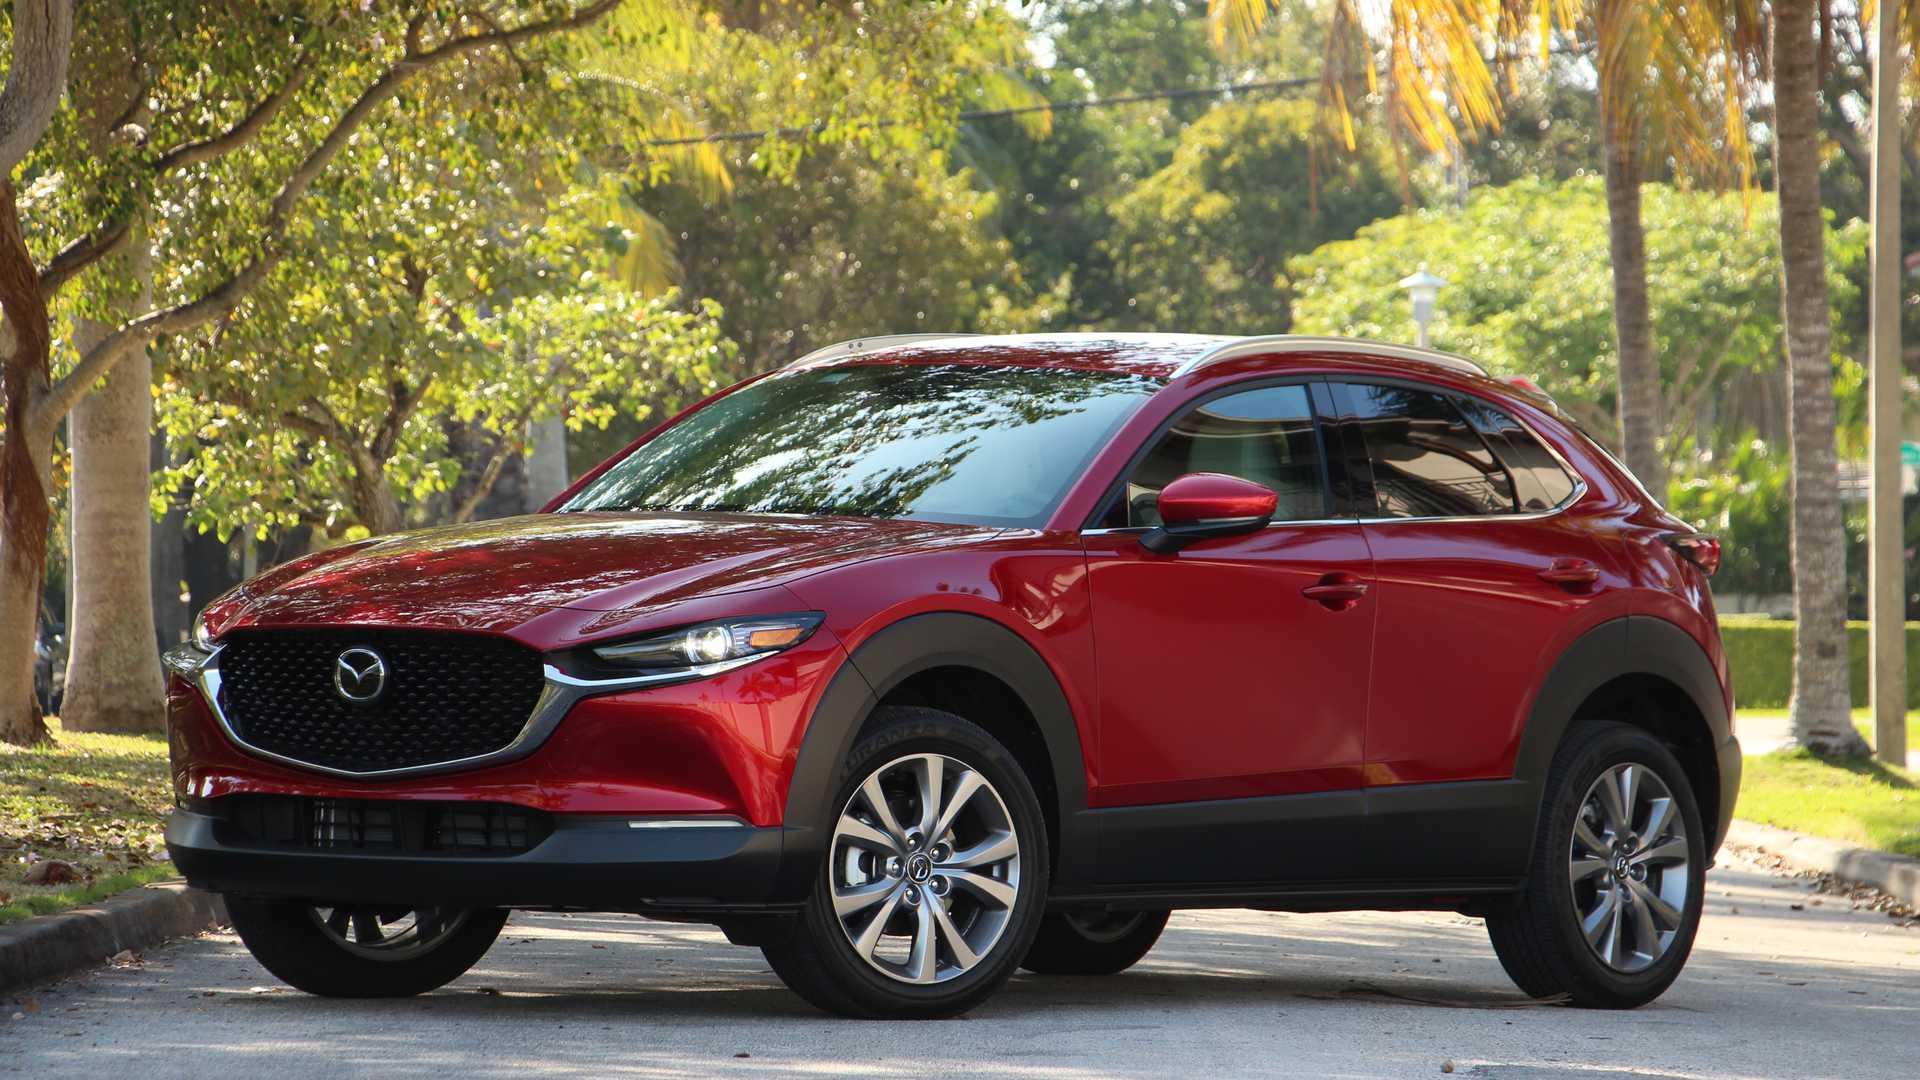 2022 Mazda Cx 30 Premium 0 60 Awd Msrp News Hybrid